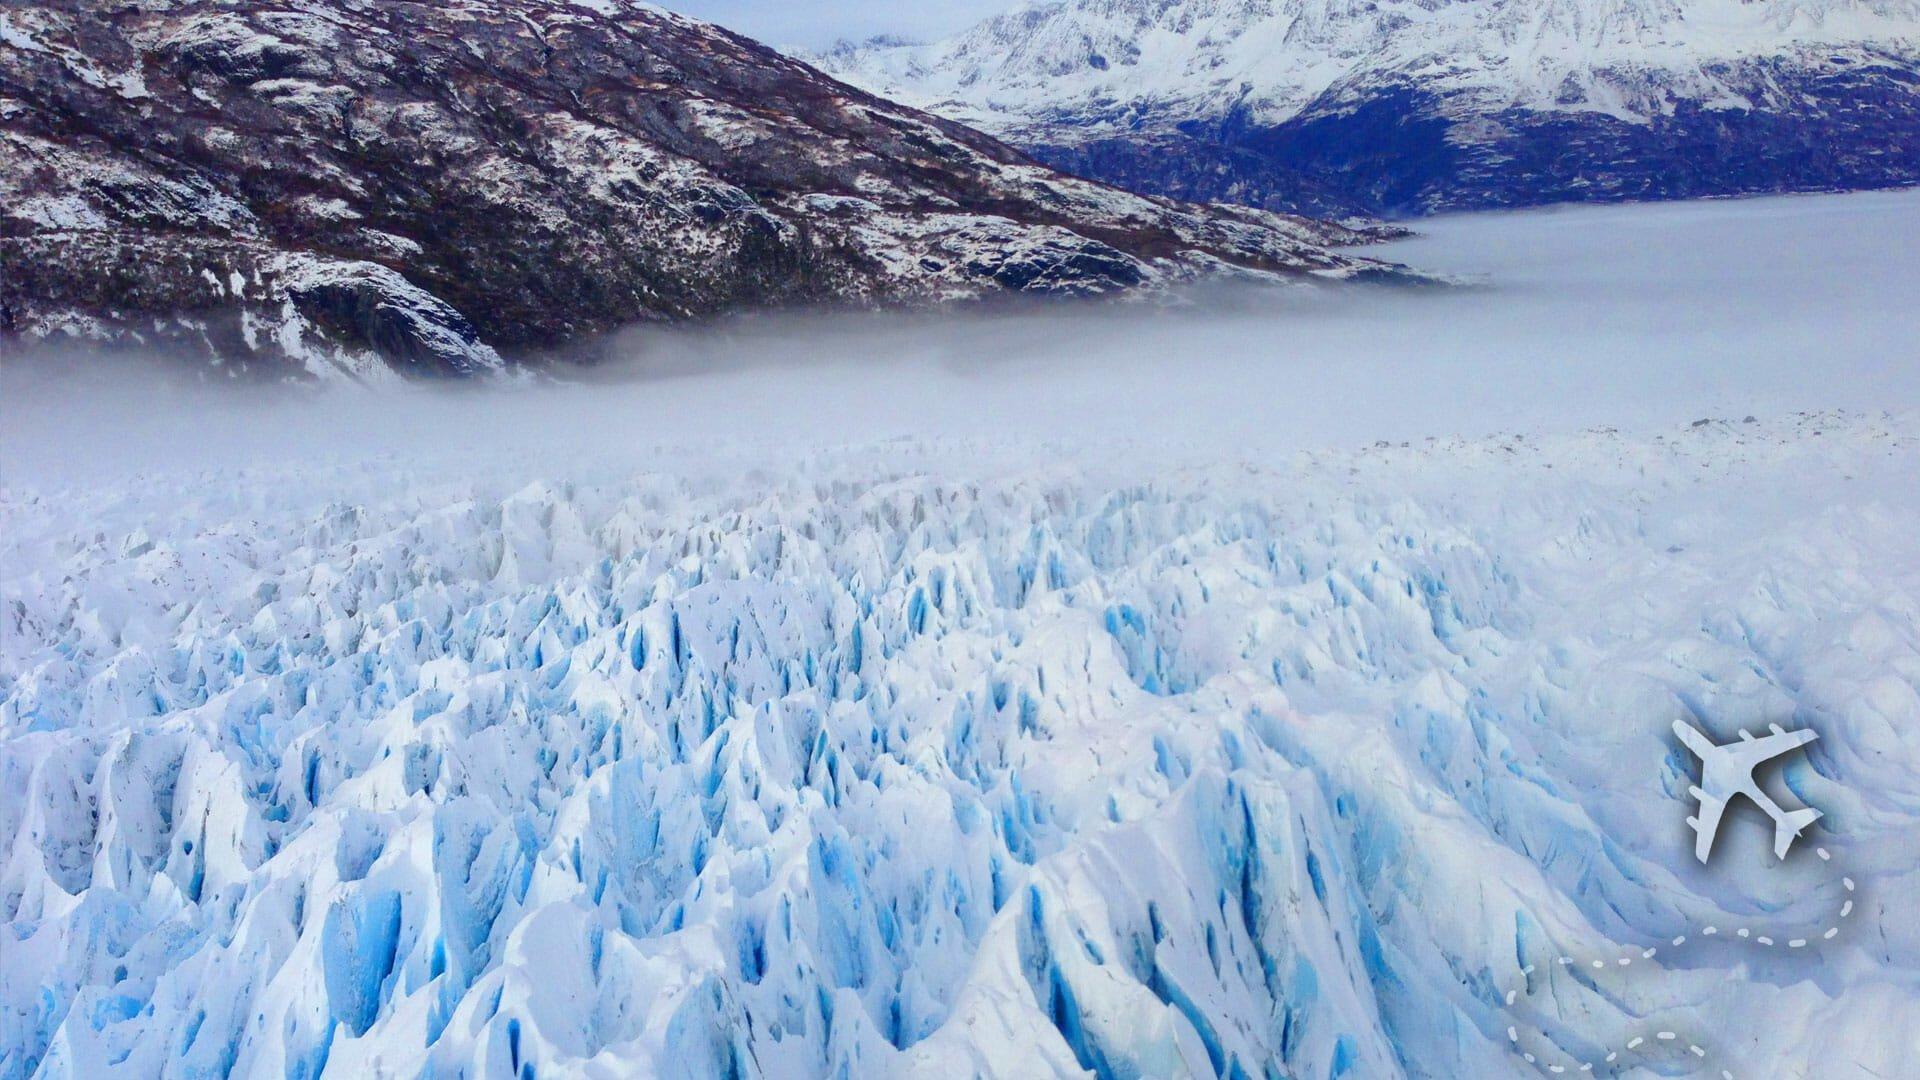 Lake George and Knik Glacier